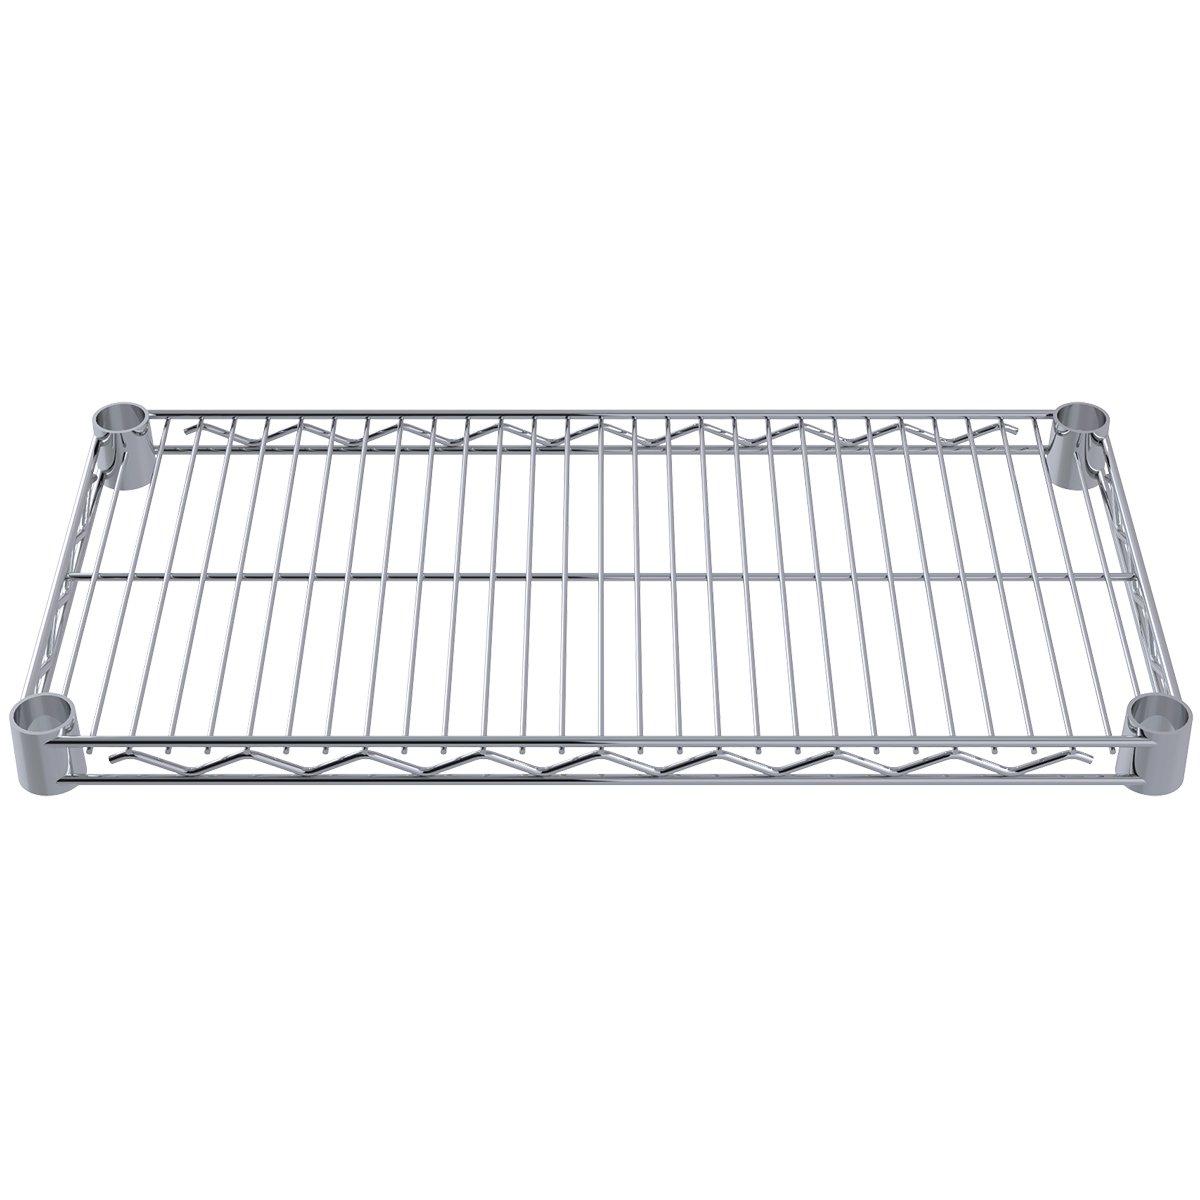 Akro-Mils AWS1224SHELF 12-Inch X 24-Inch NSF Approved Industrial Grade Chrome Wire Shelf, 4-Pack